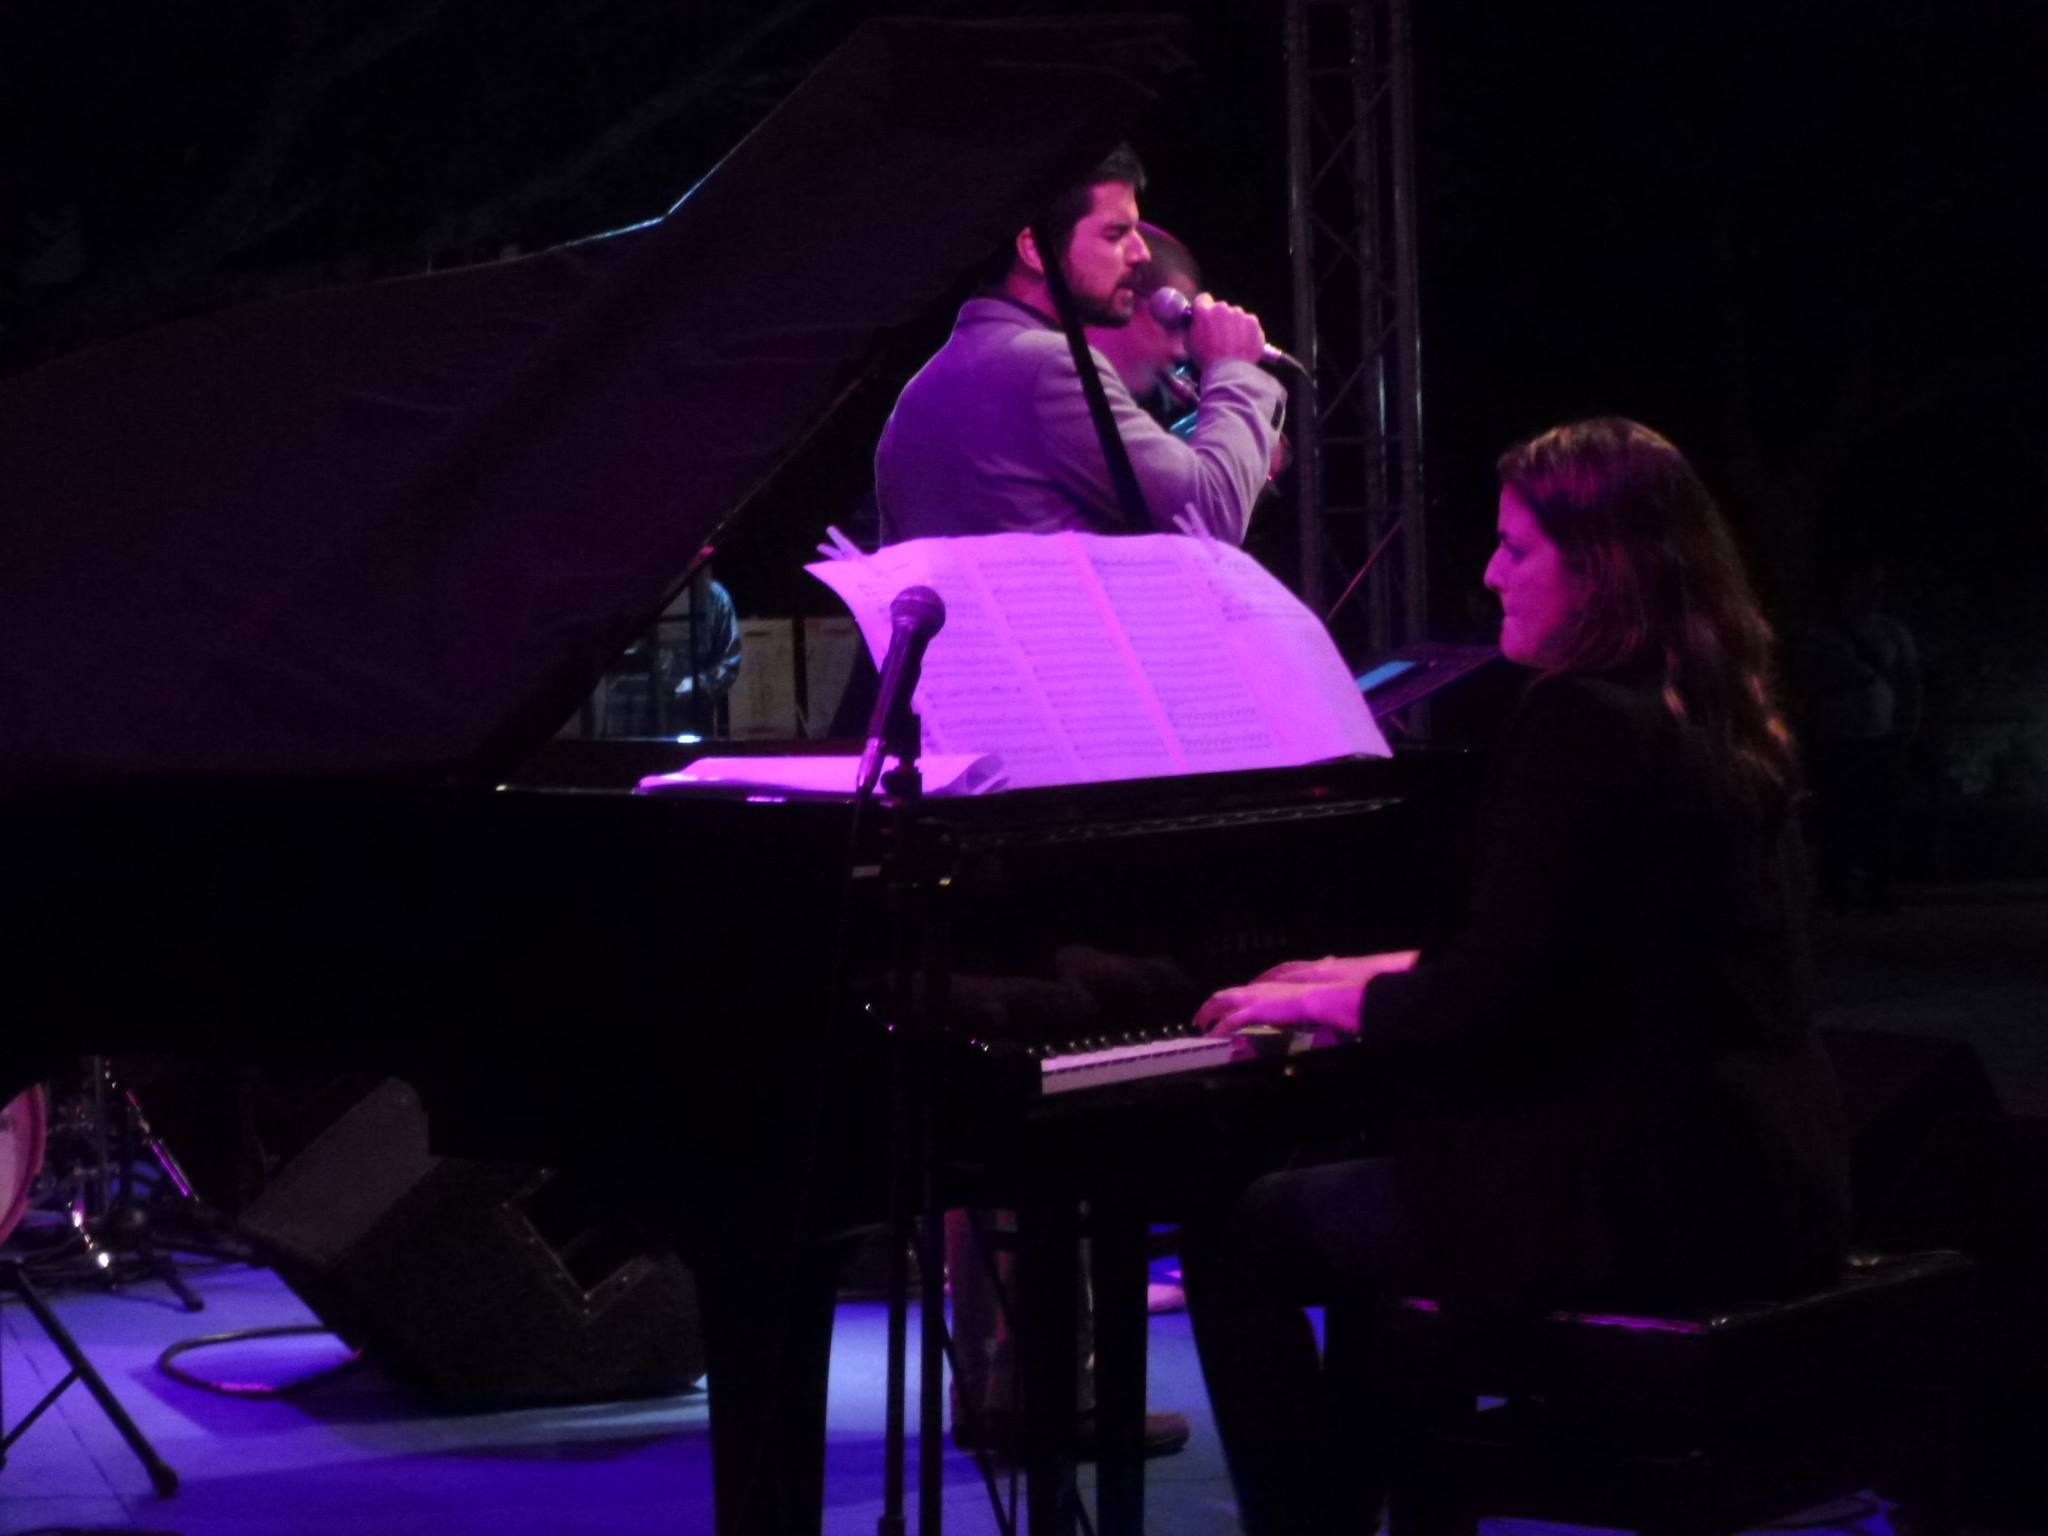 Tass Jazz 2018 Nuit 2